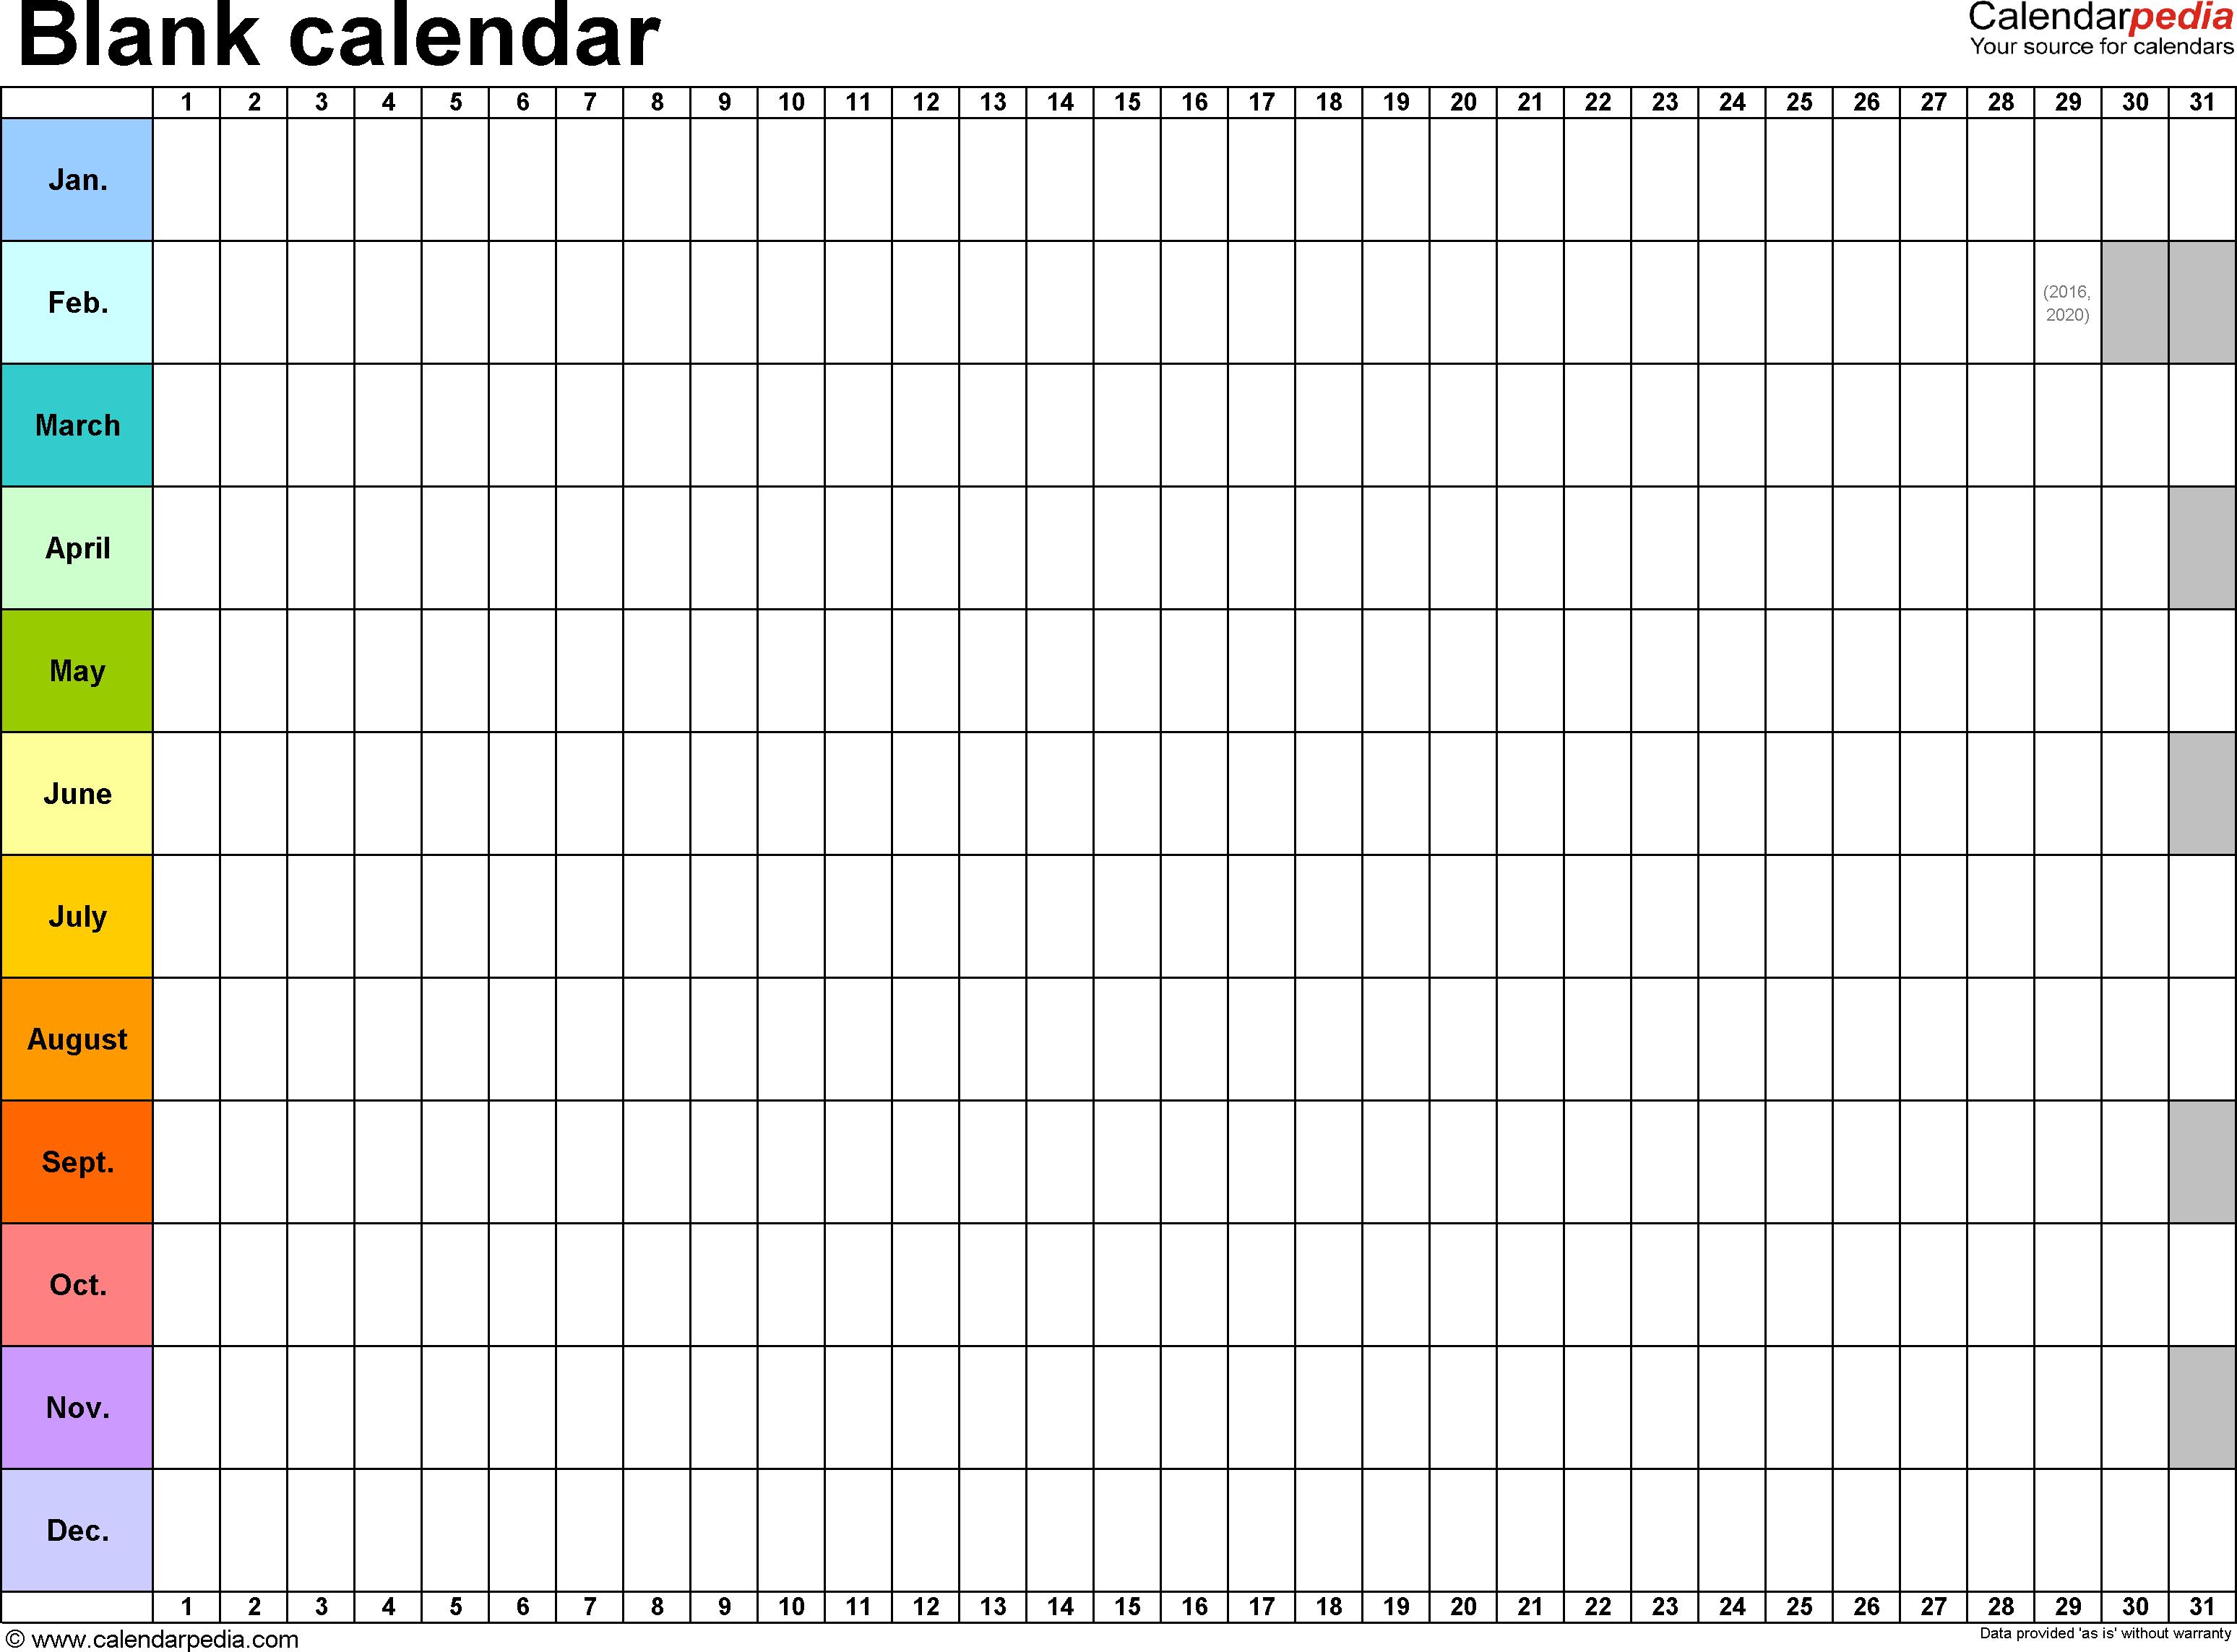 Blank Calendar - 9 Free Printable Microsoft Word Templates regarding Calendar Templates In Office 365